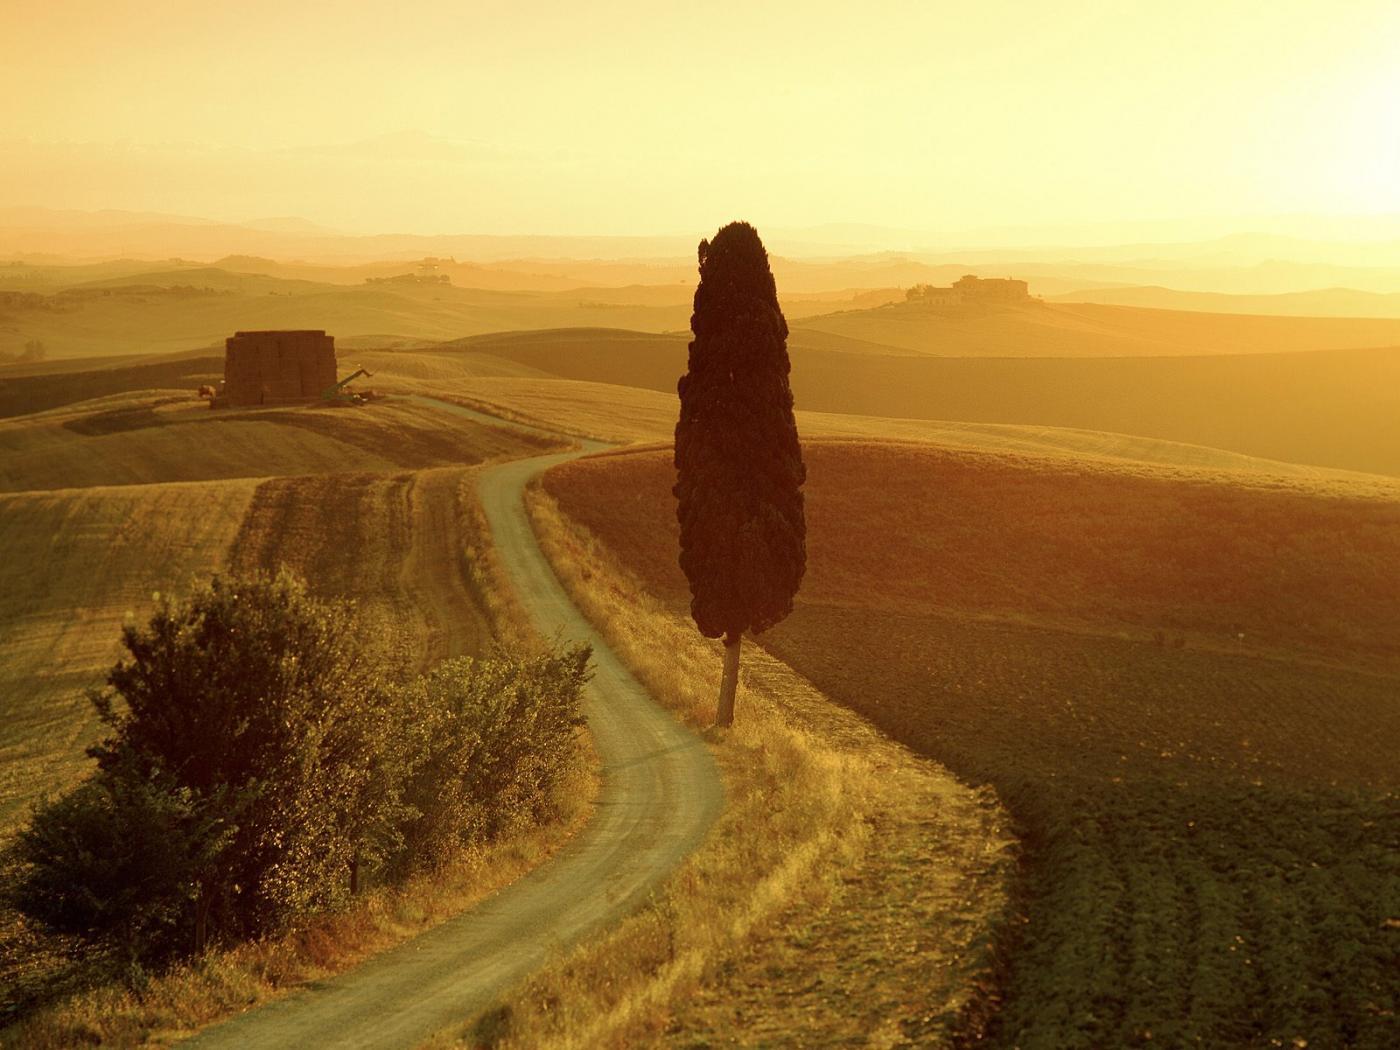 tuscan20landscape20at20sunrise20italy.jpg